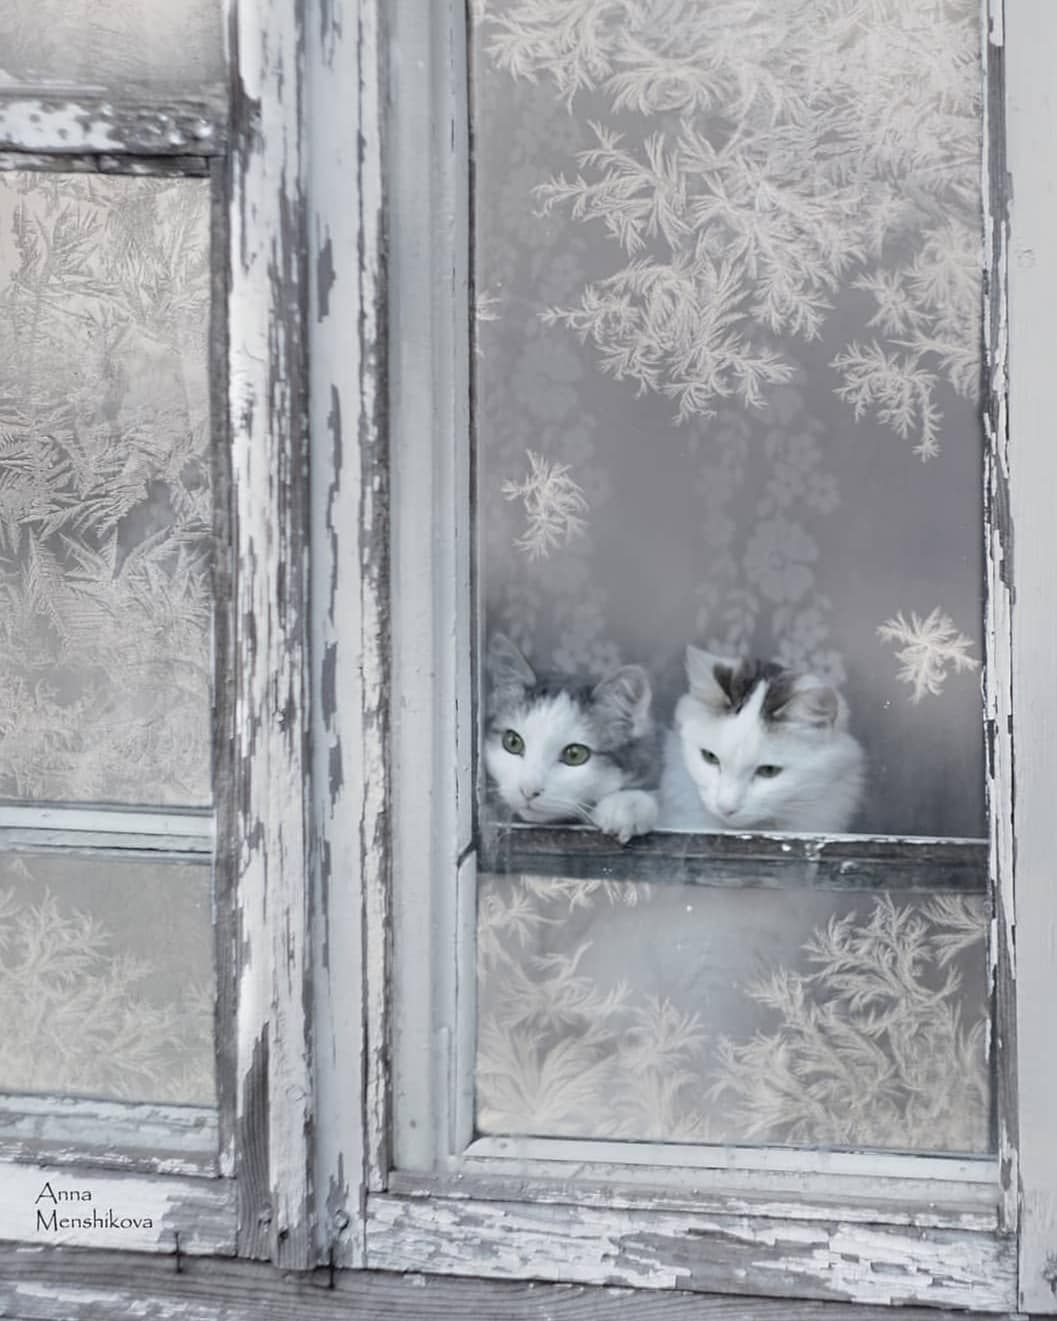 Pin on Winter Wonders